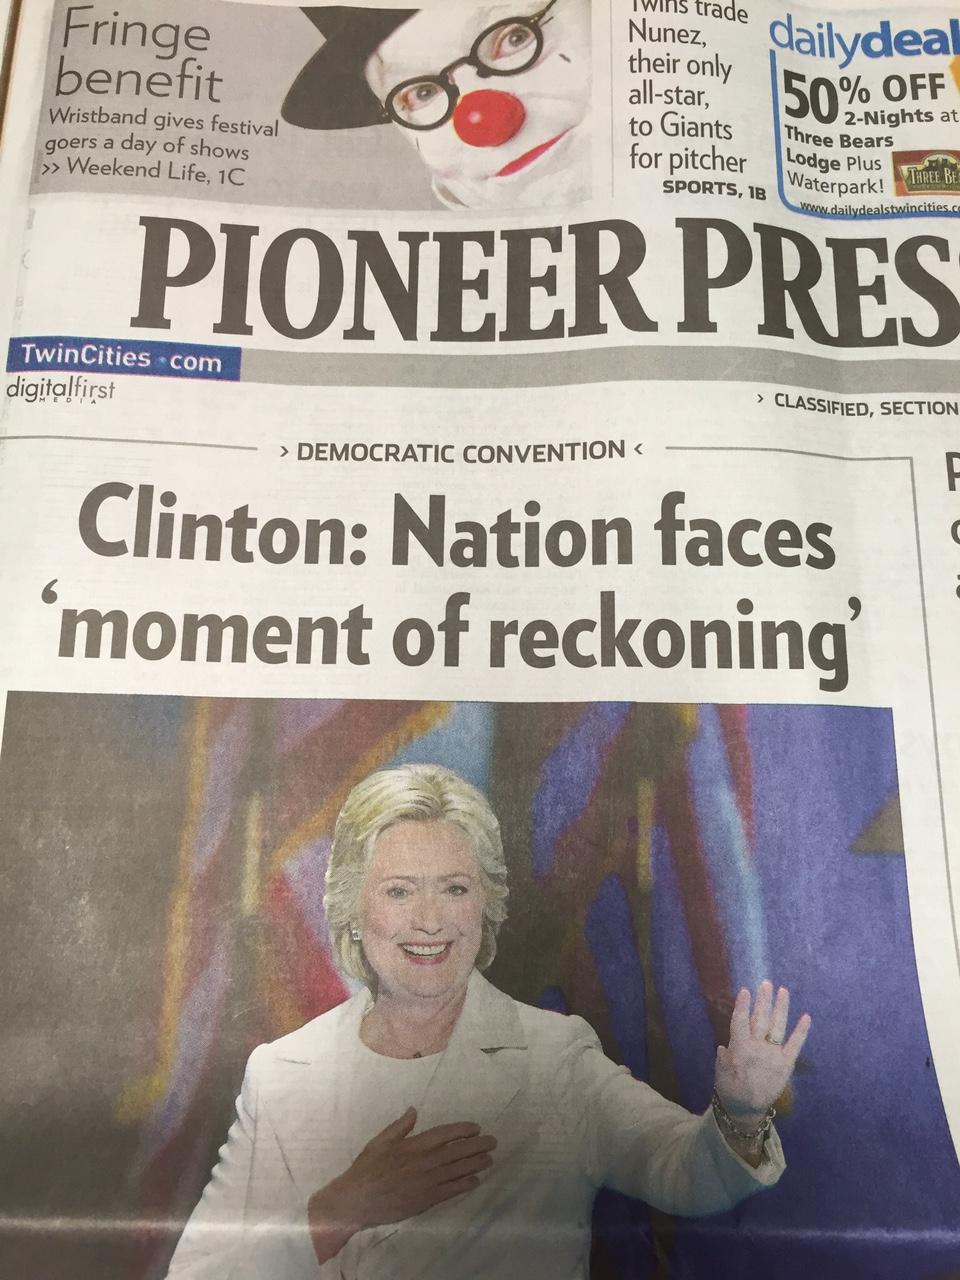 Pioneer Press Photo